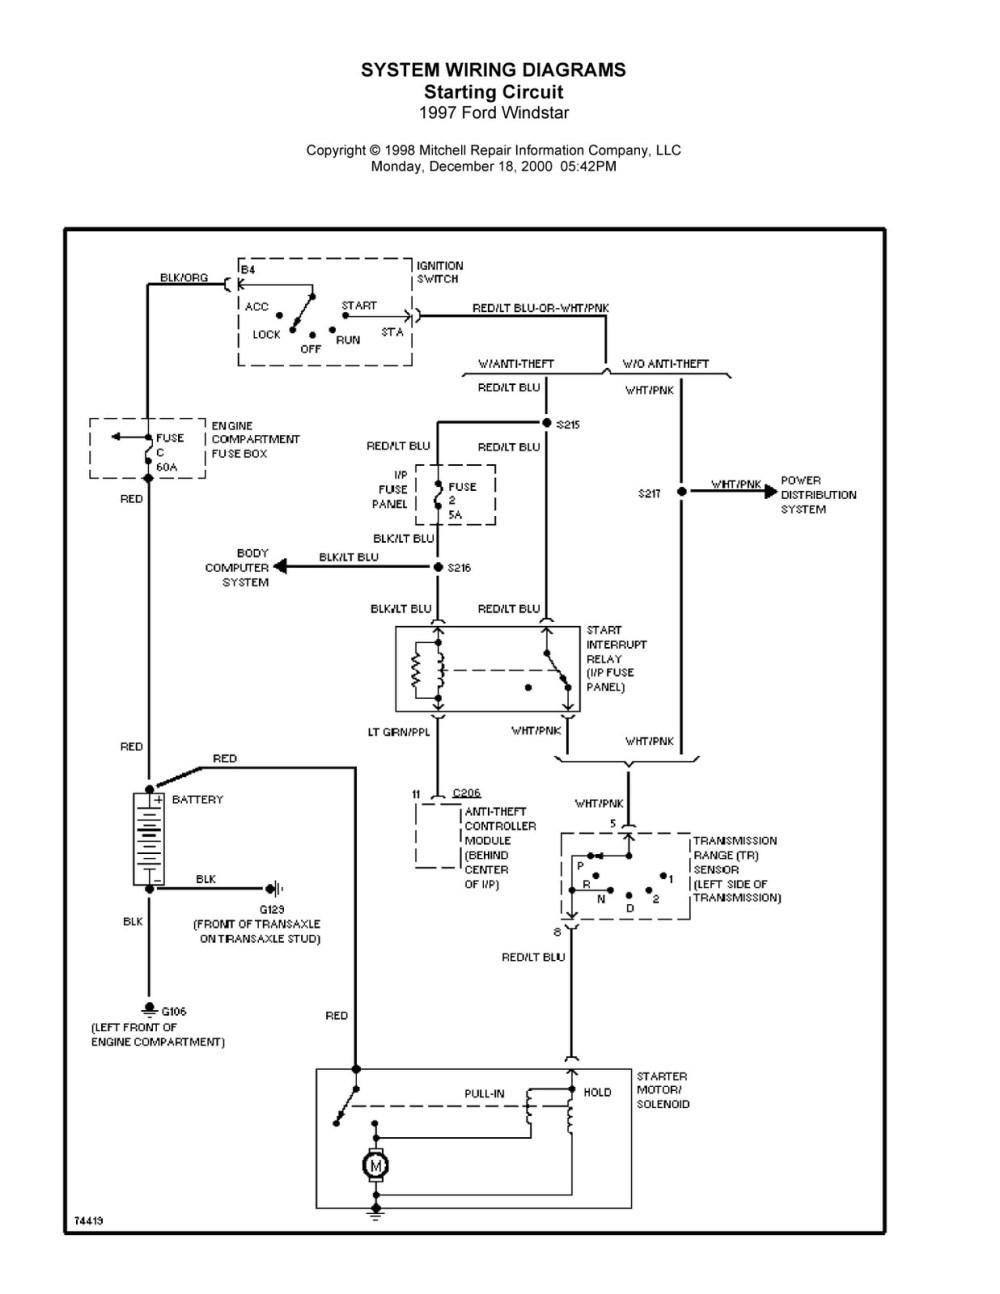 medium resolution of  ford windstar electrical diagram 1996 windstar starter runs in accessory run and start positions 0047 jpg 1996 windstar starter runs